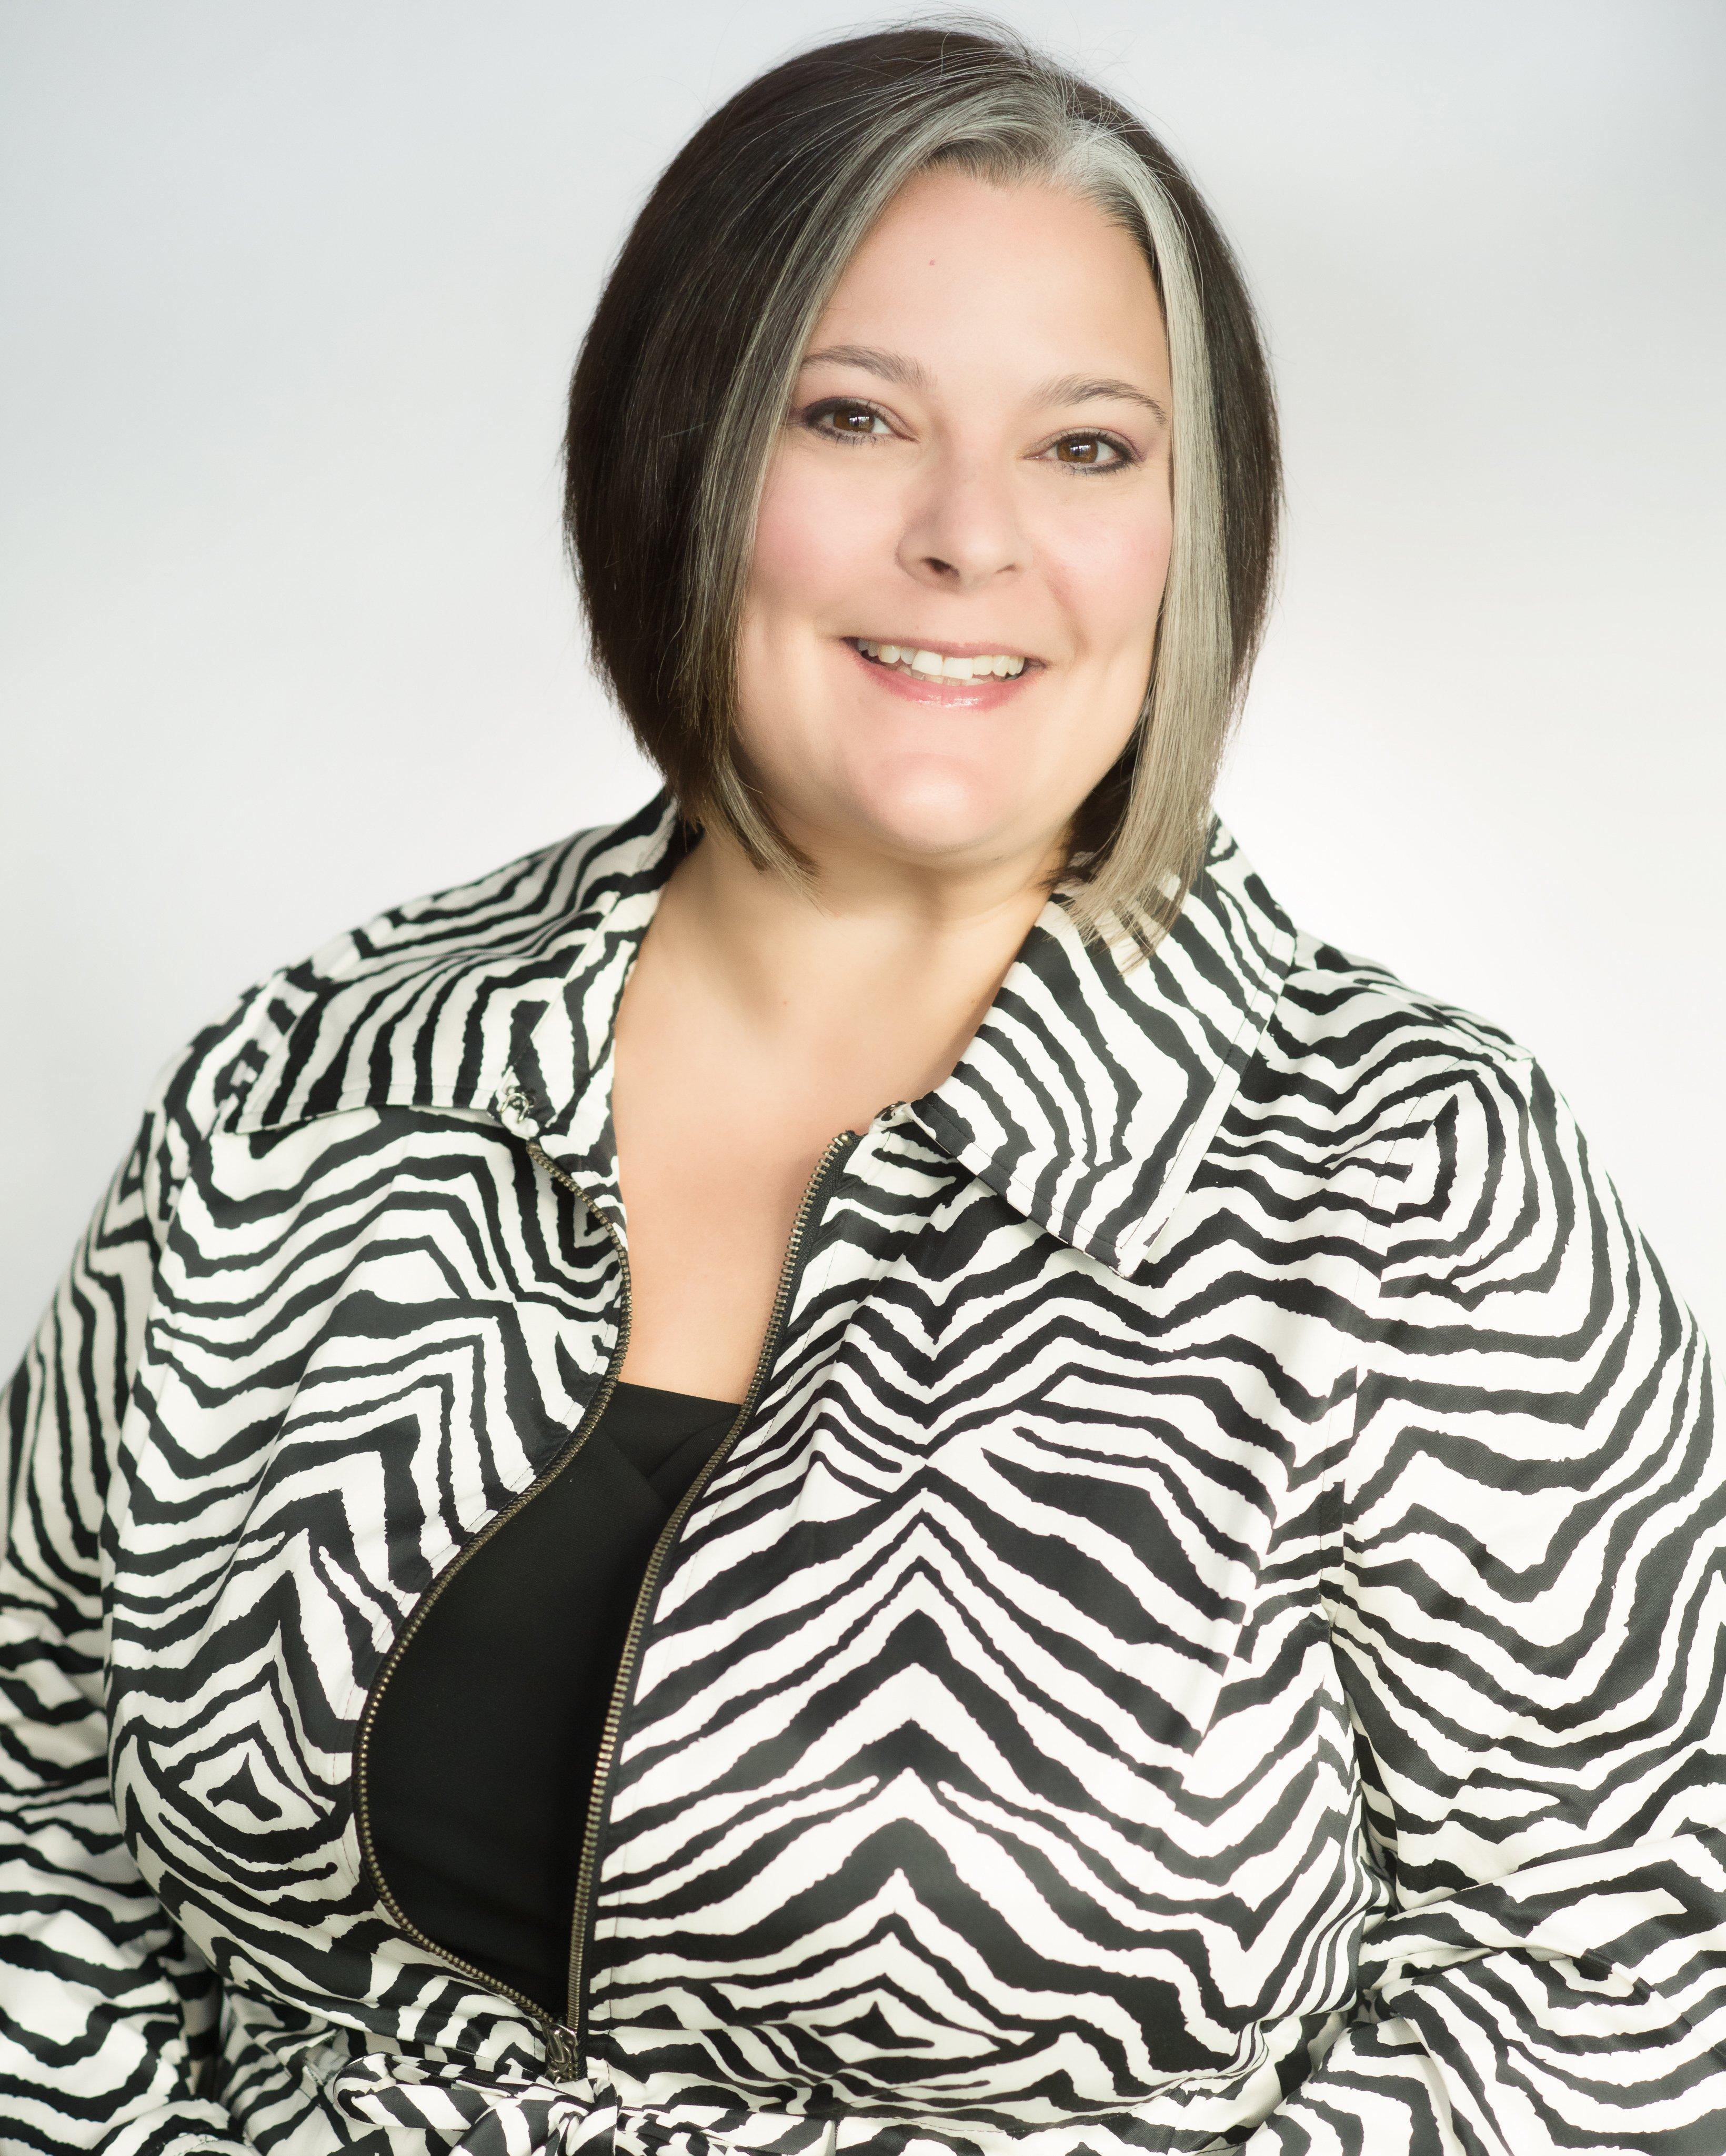 Sarah Gonnella